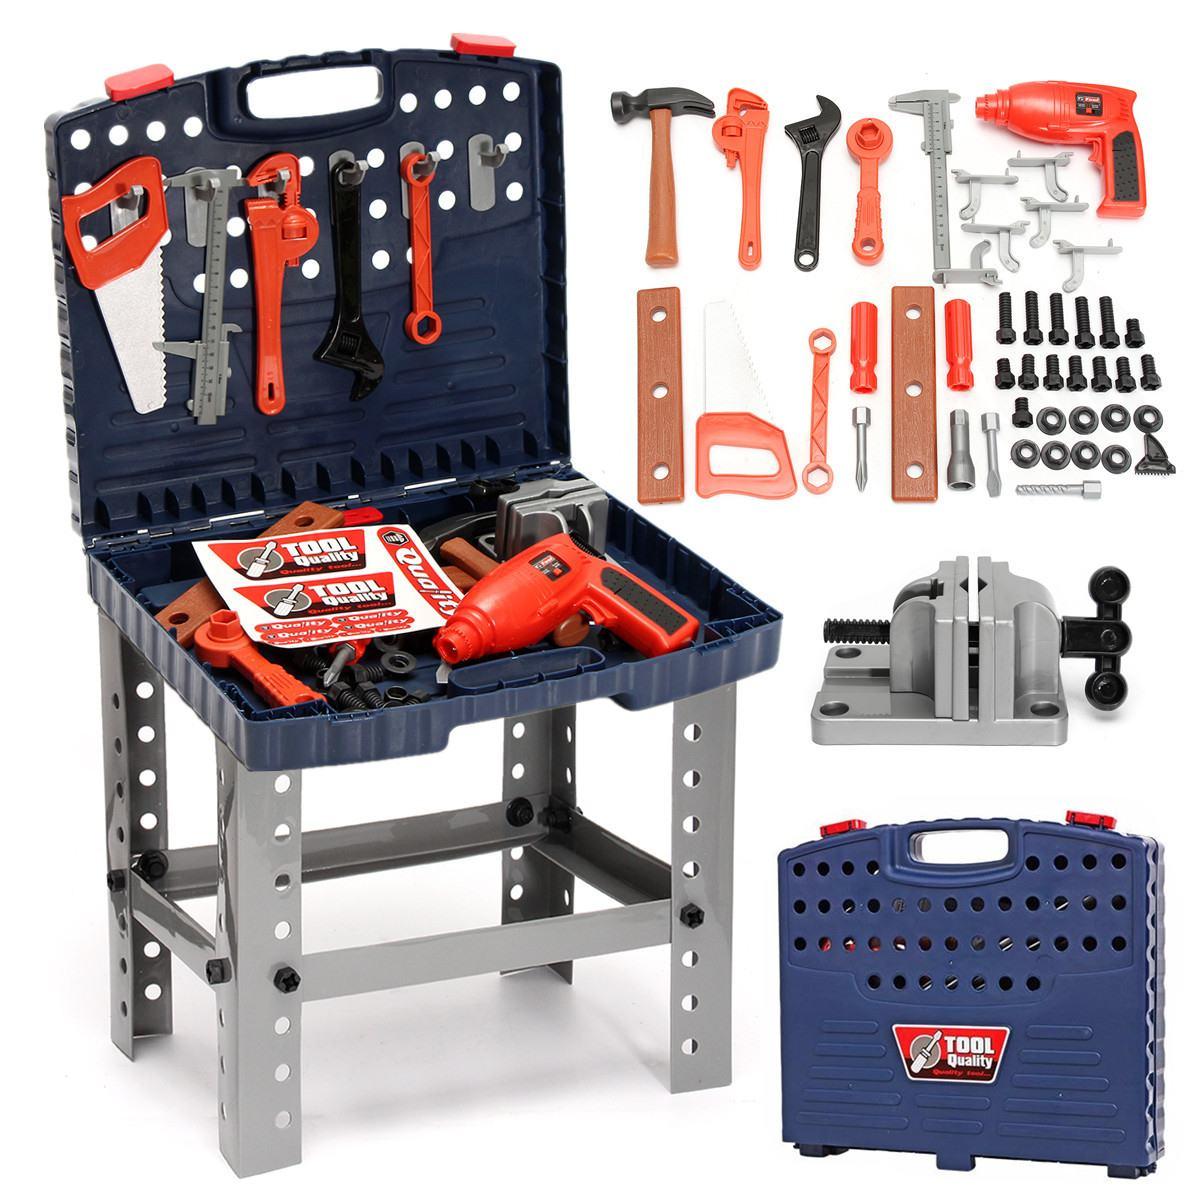 69PCS/Set KidsToolbox Kit  Children's Simulation Repair Tools Workbench Toy Set Engineering Learning Toys Plastic Hand DIY Tools